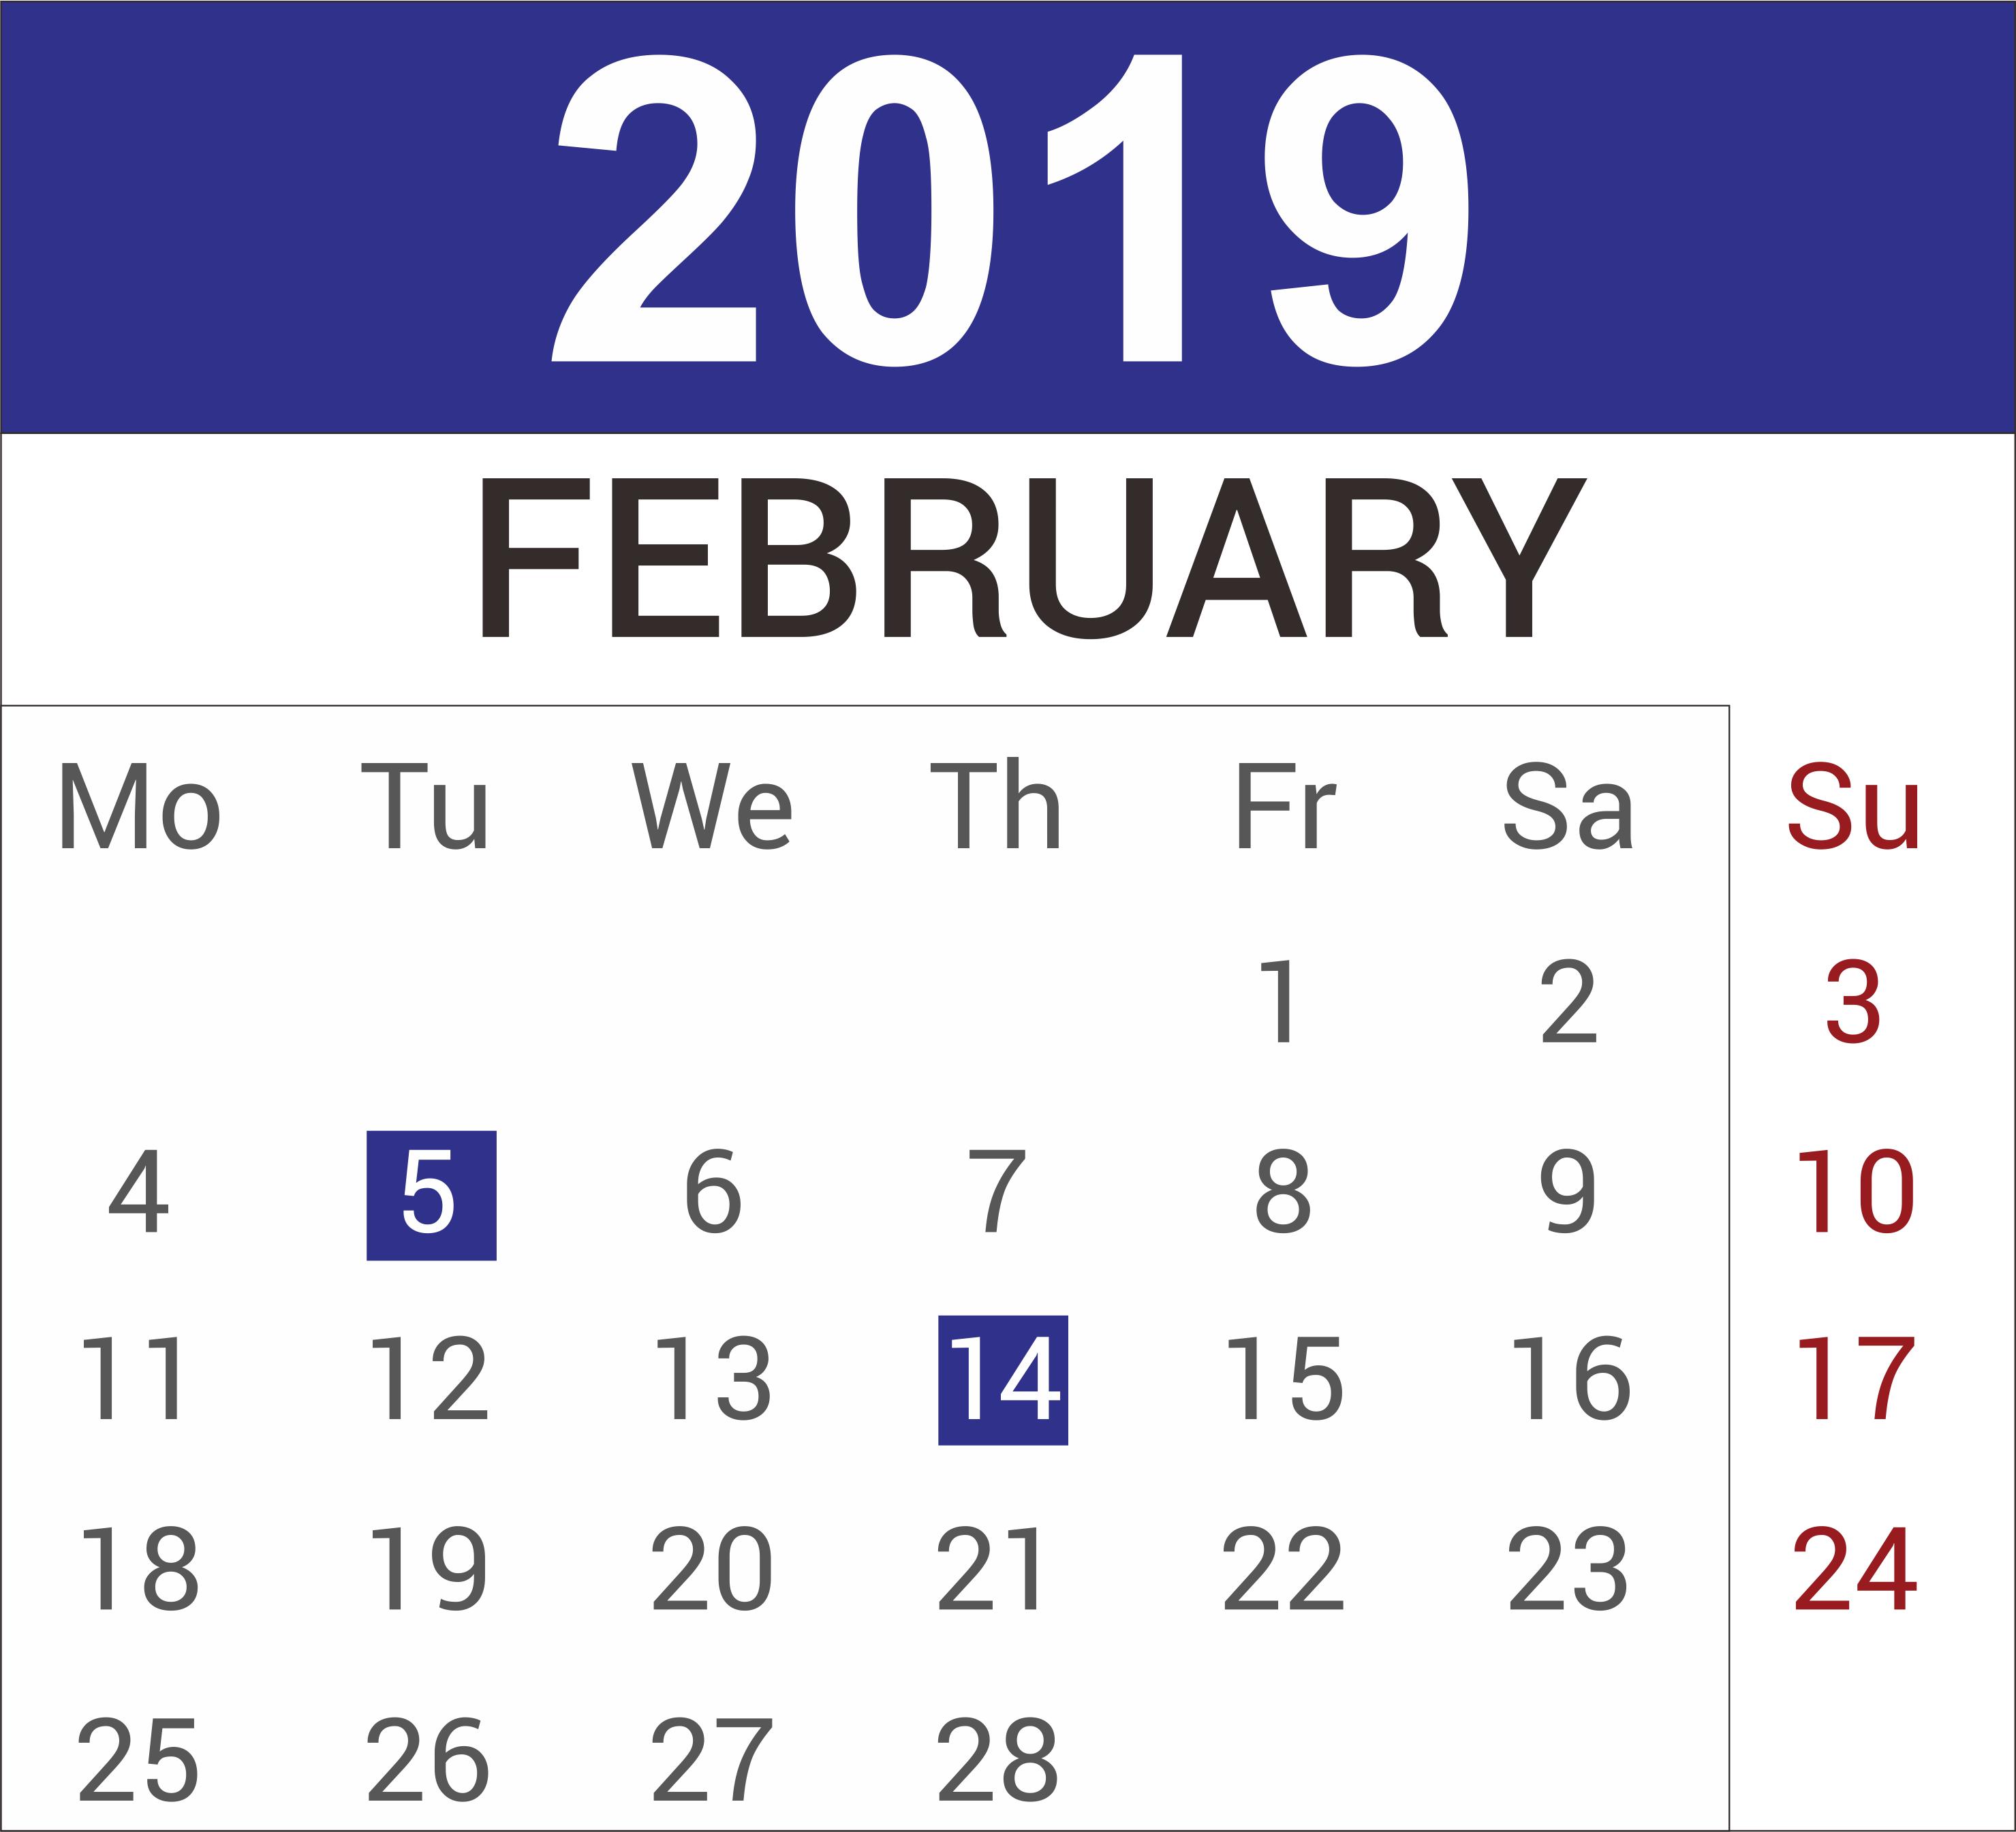 February 2019 Printable Calendar Page